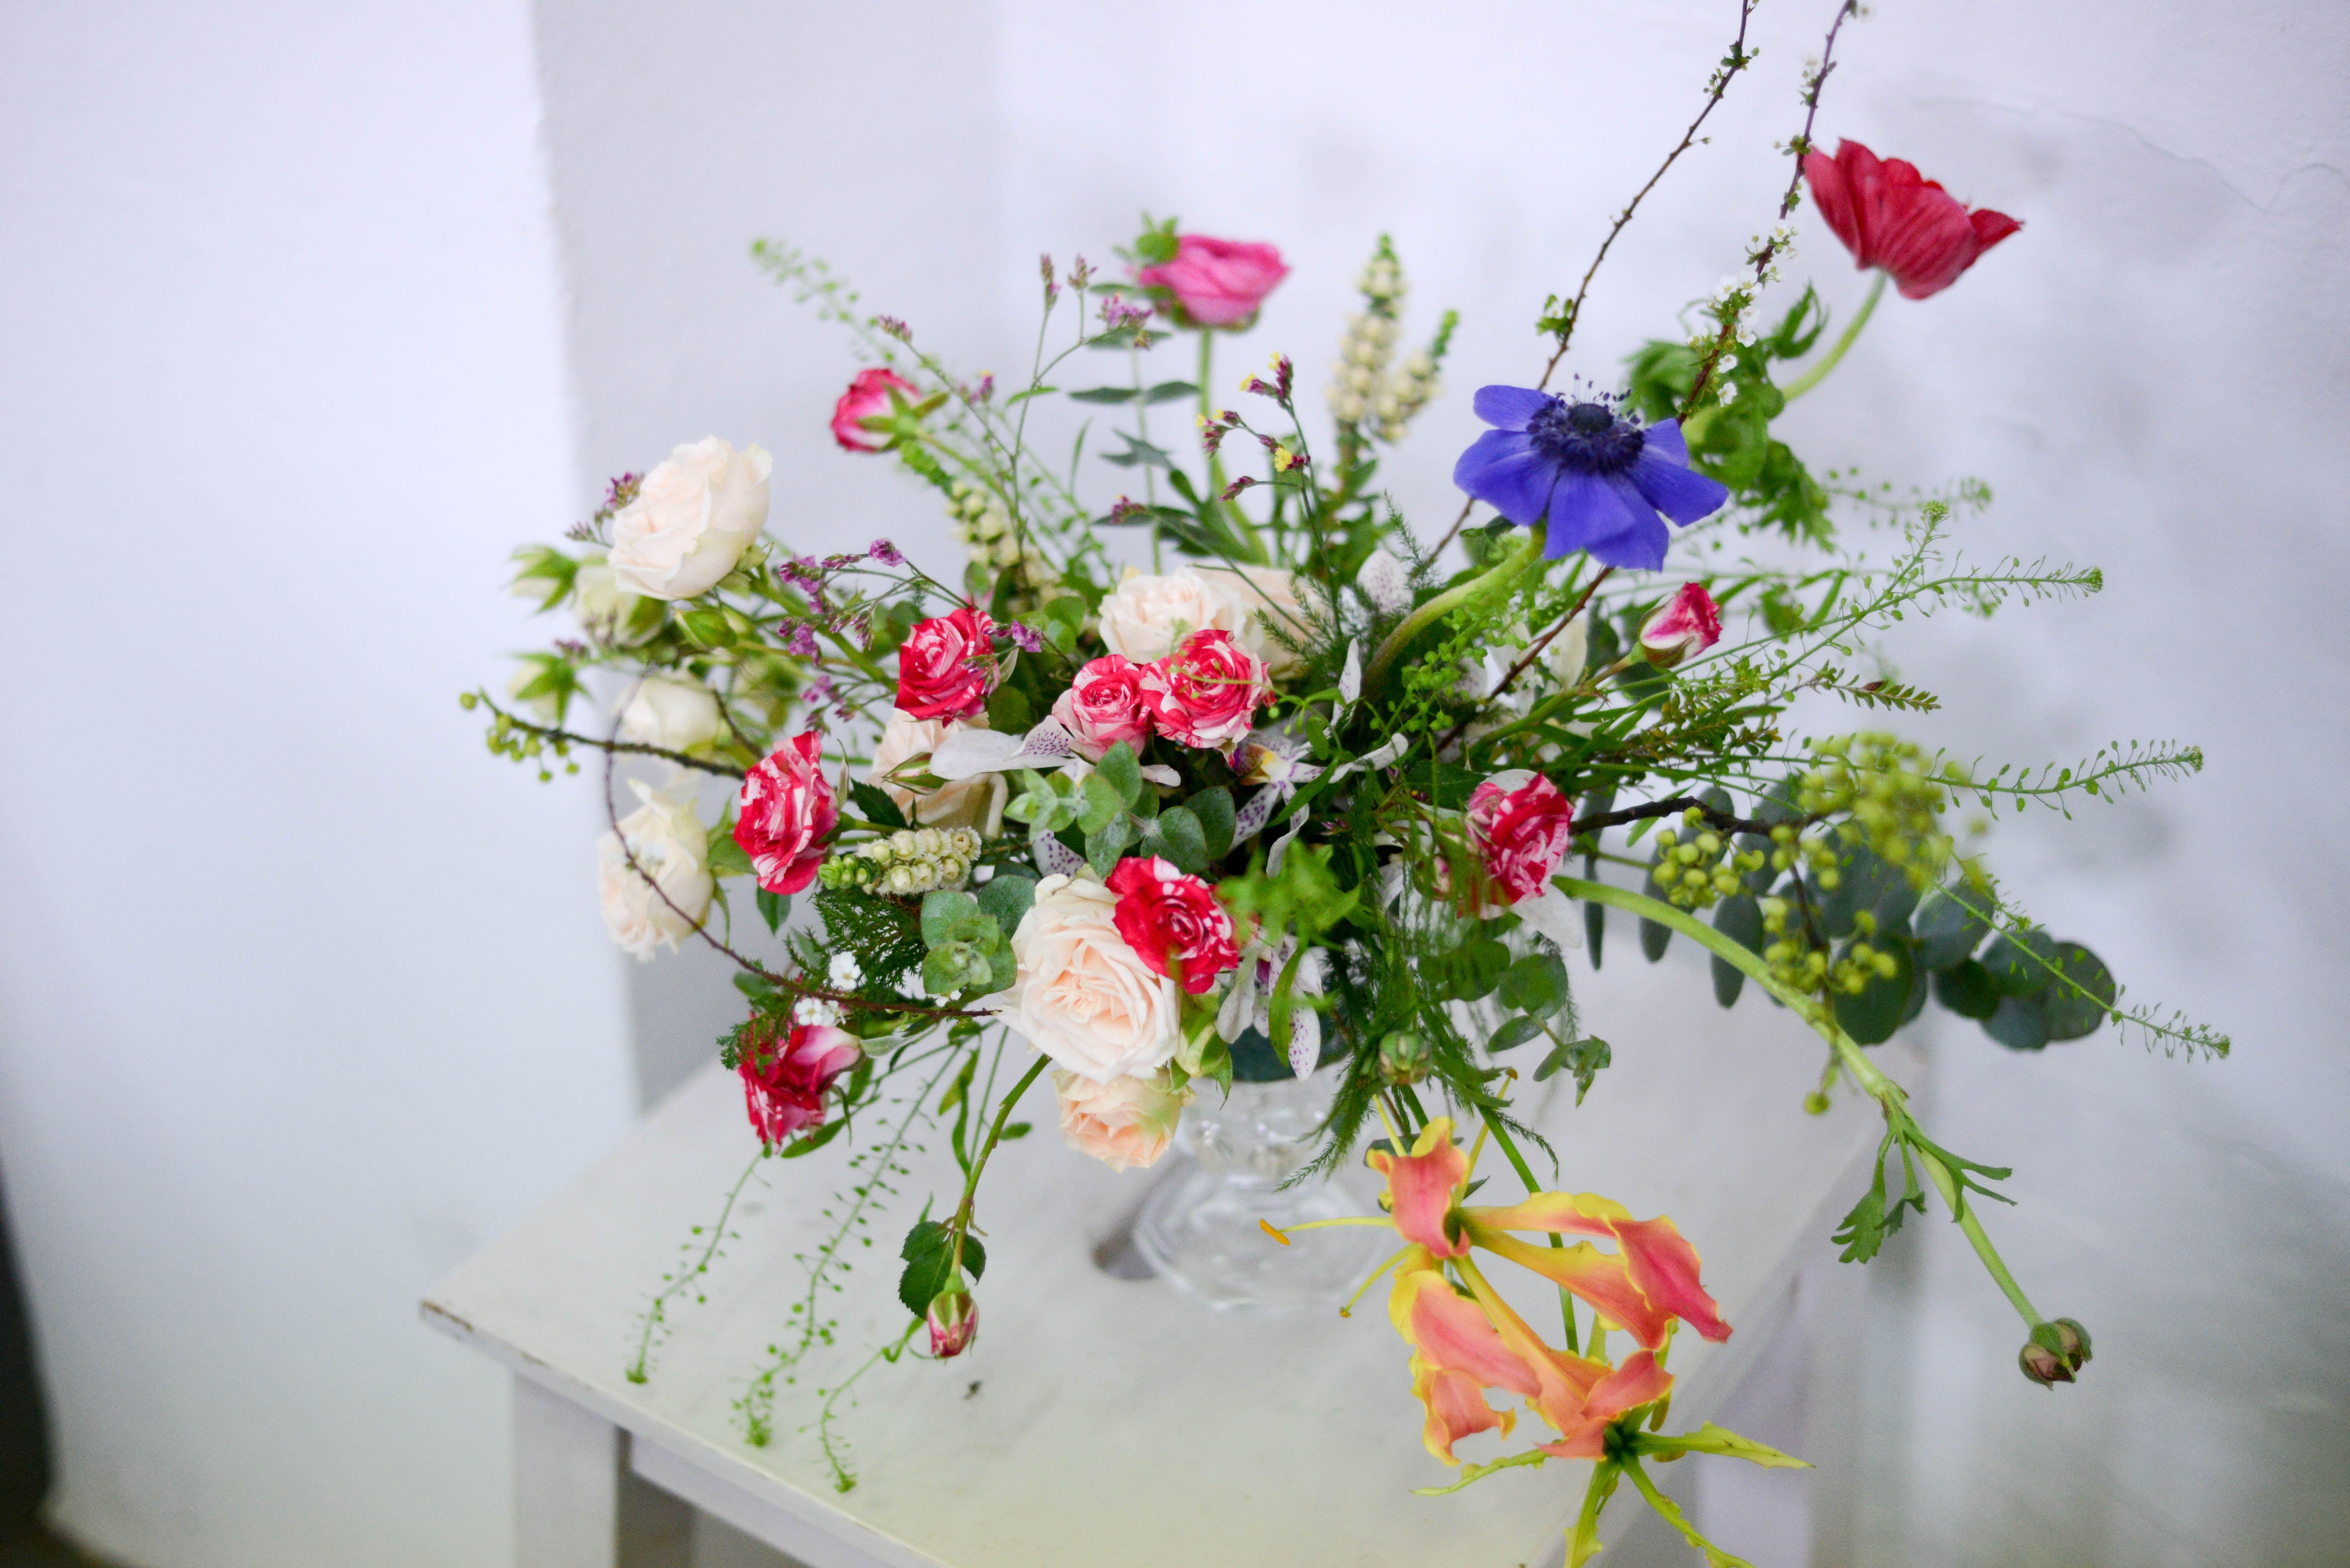 Dancing Florals By Poppy Dance Dance Dance Flowerworkshop